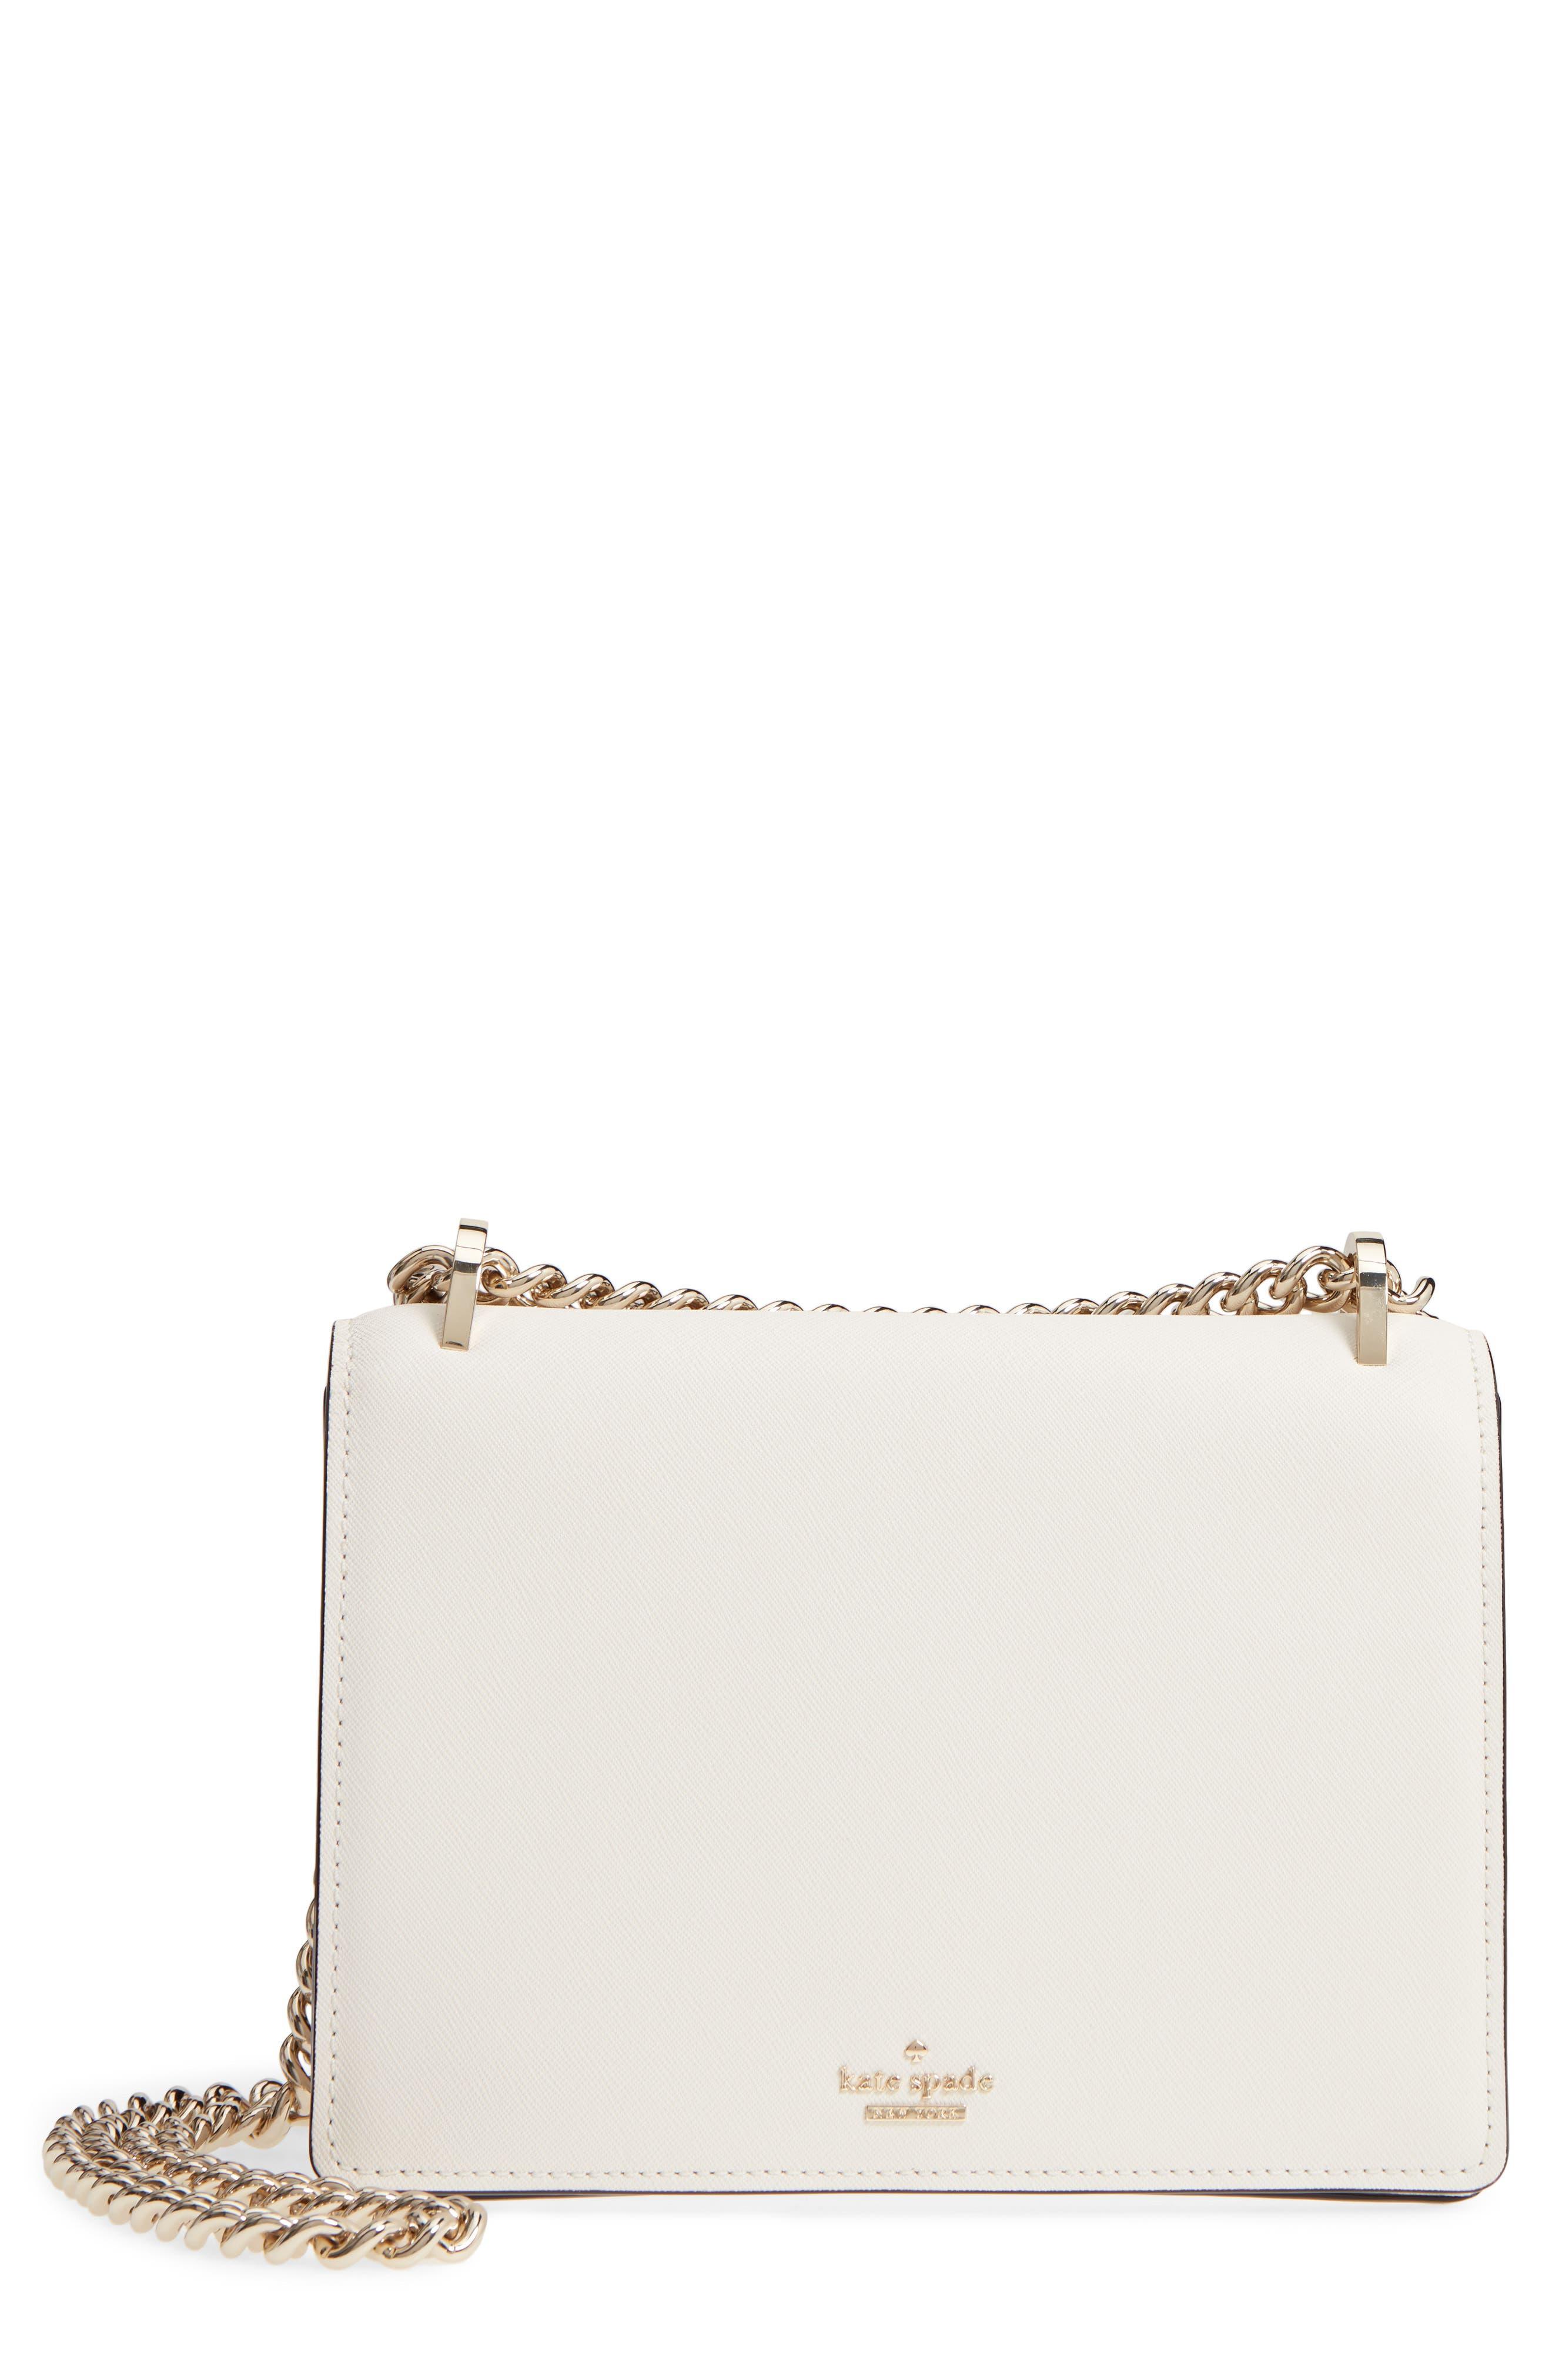 cameron street marci leather shoulder bag,                             Main thumbnail 1, color,                             Cement